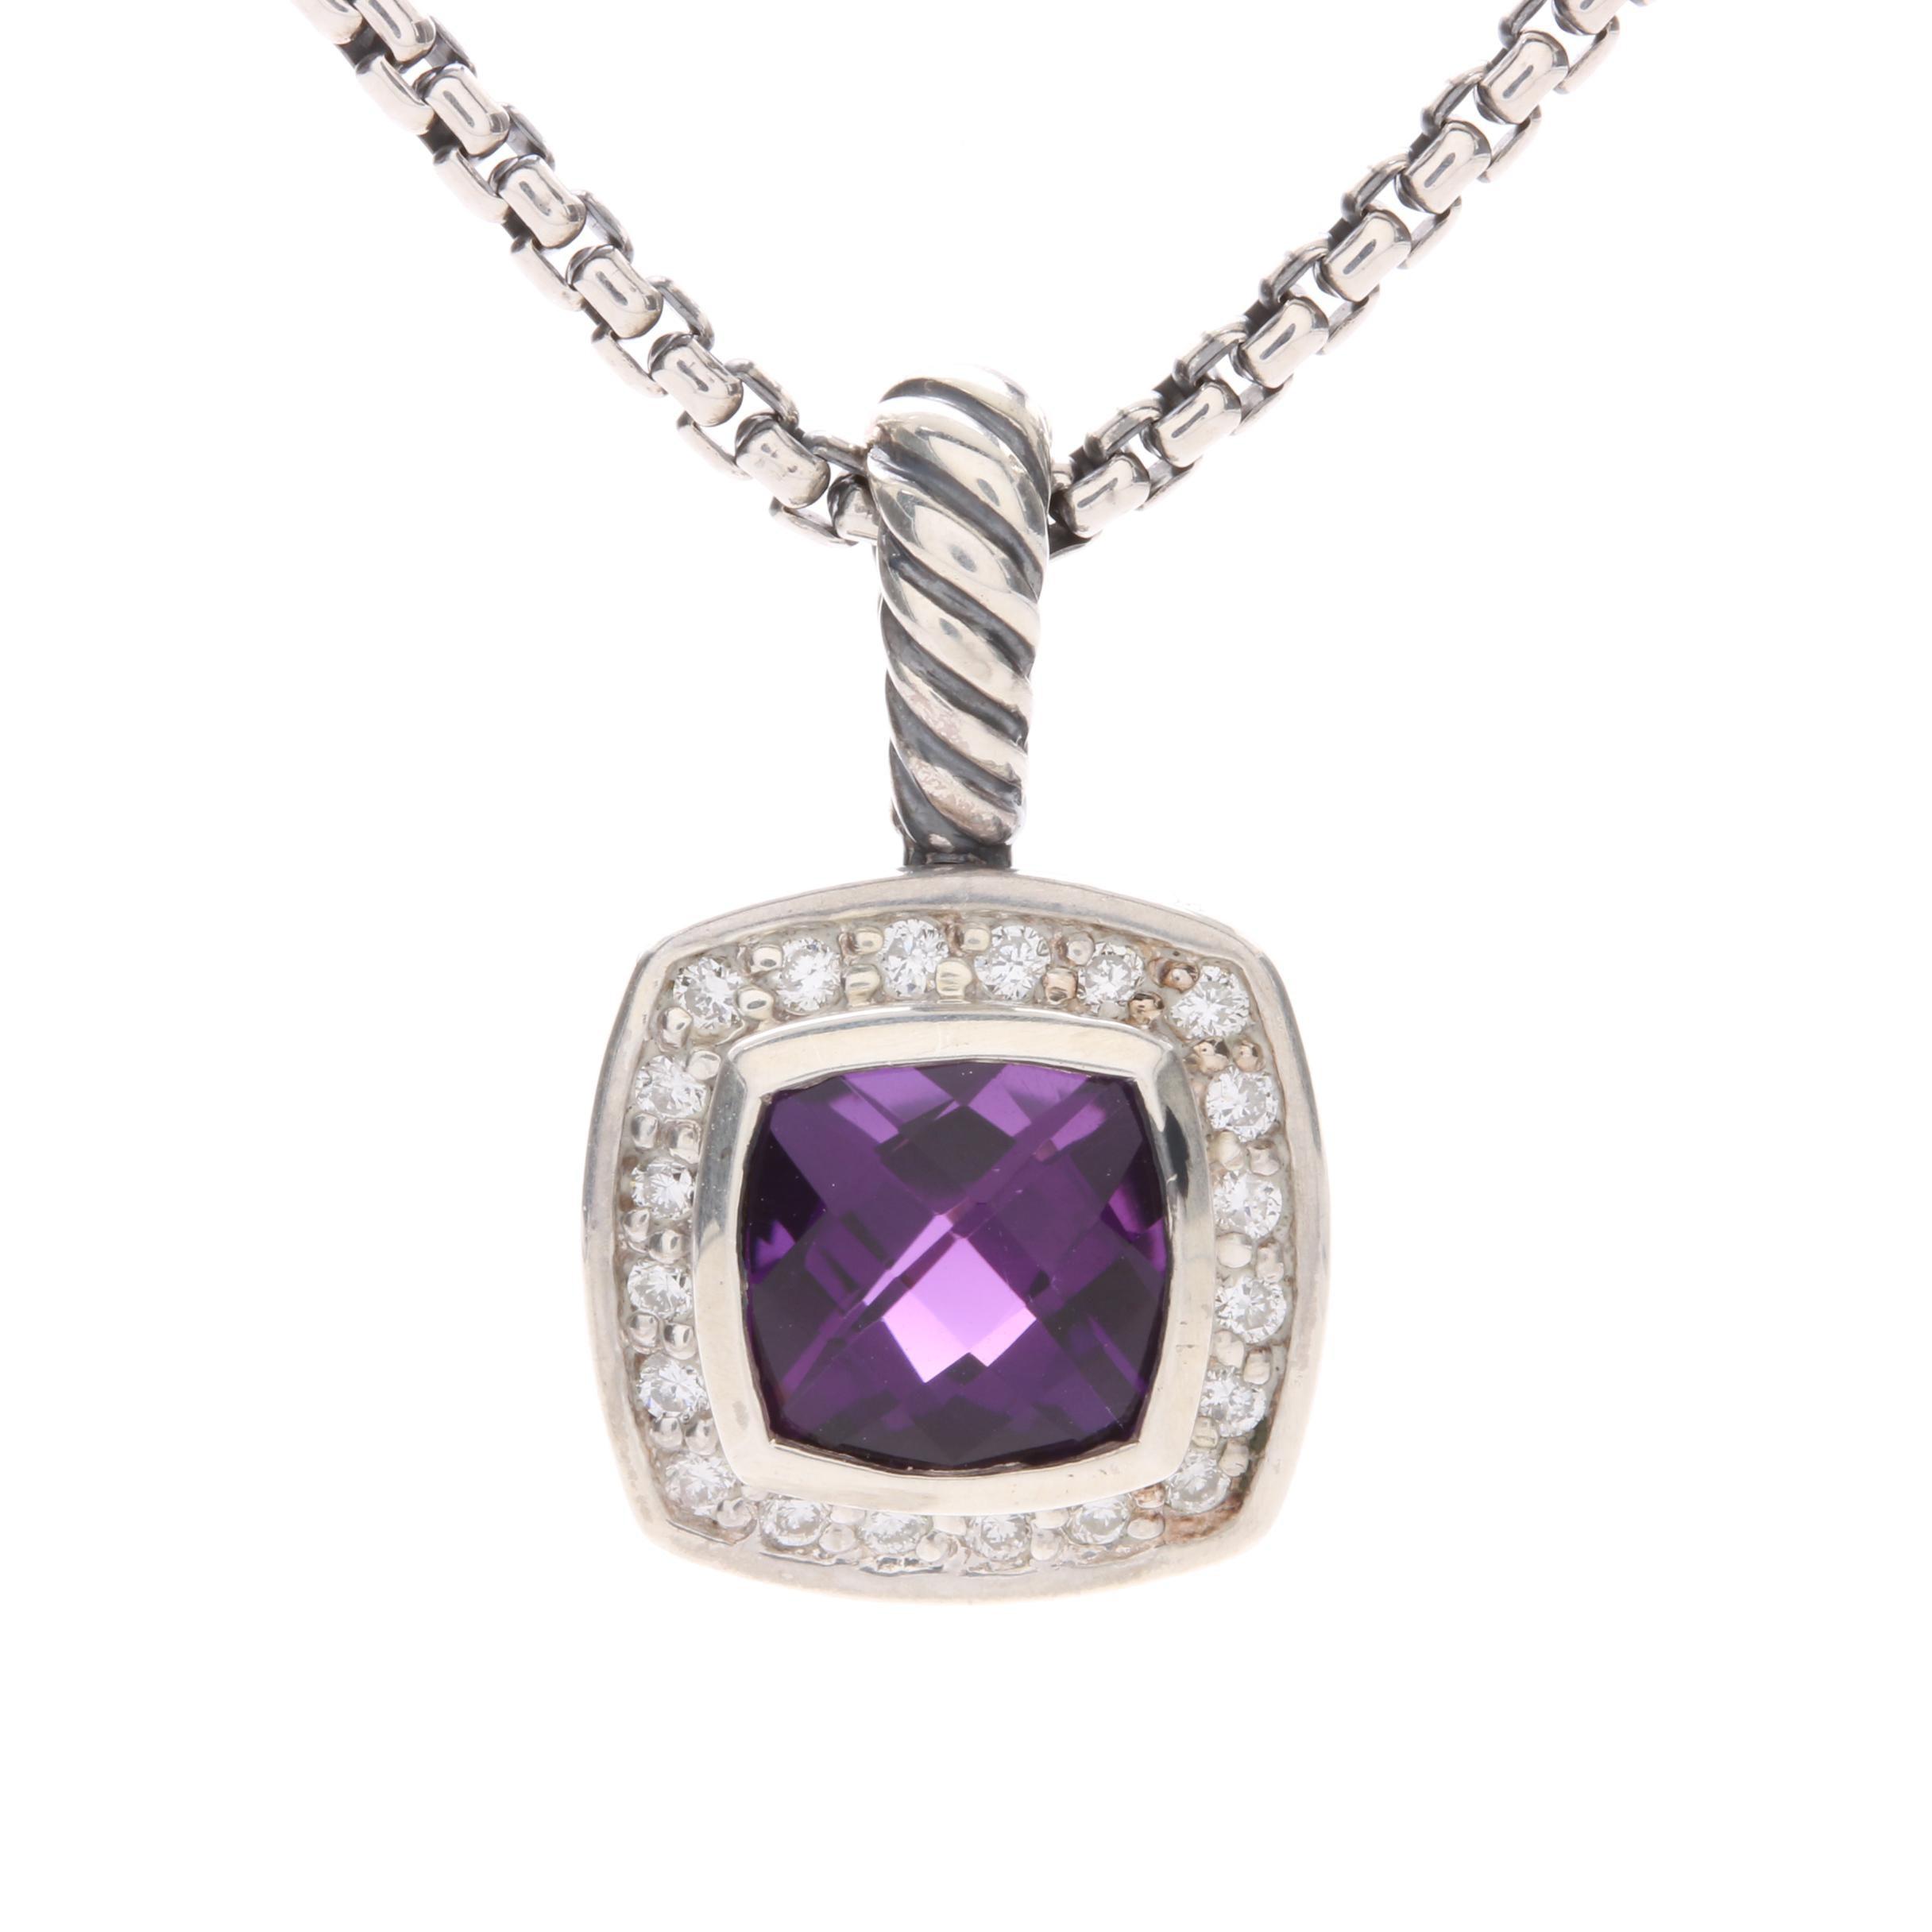 "David Yurman ""Albion"" Sterling Silver Amethyst and Diamond Pendant Necklace"